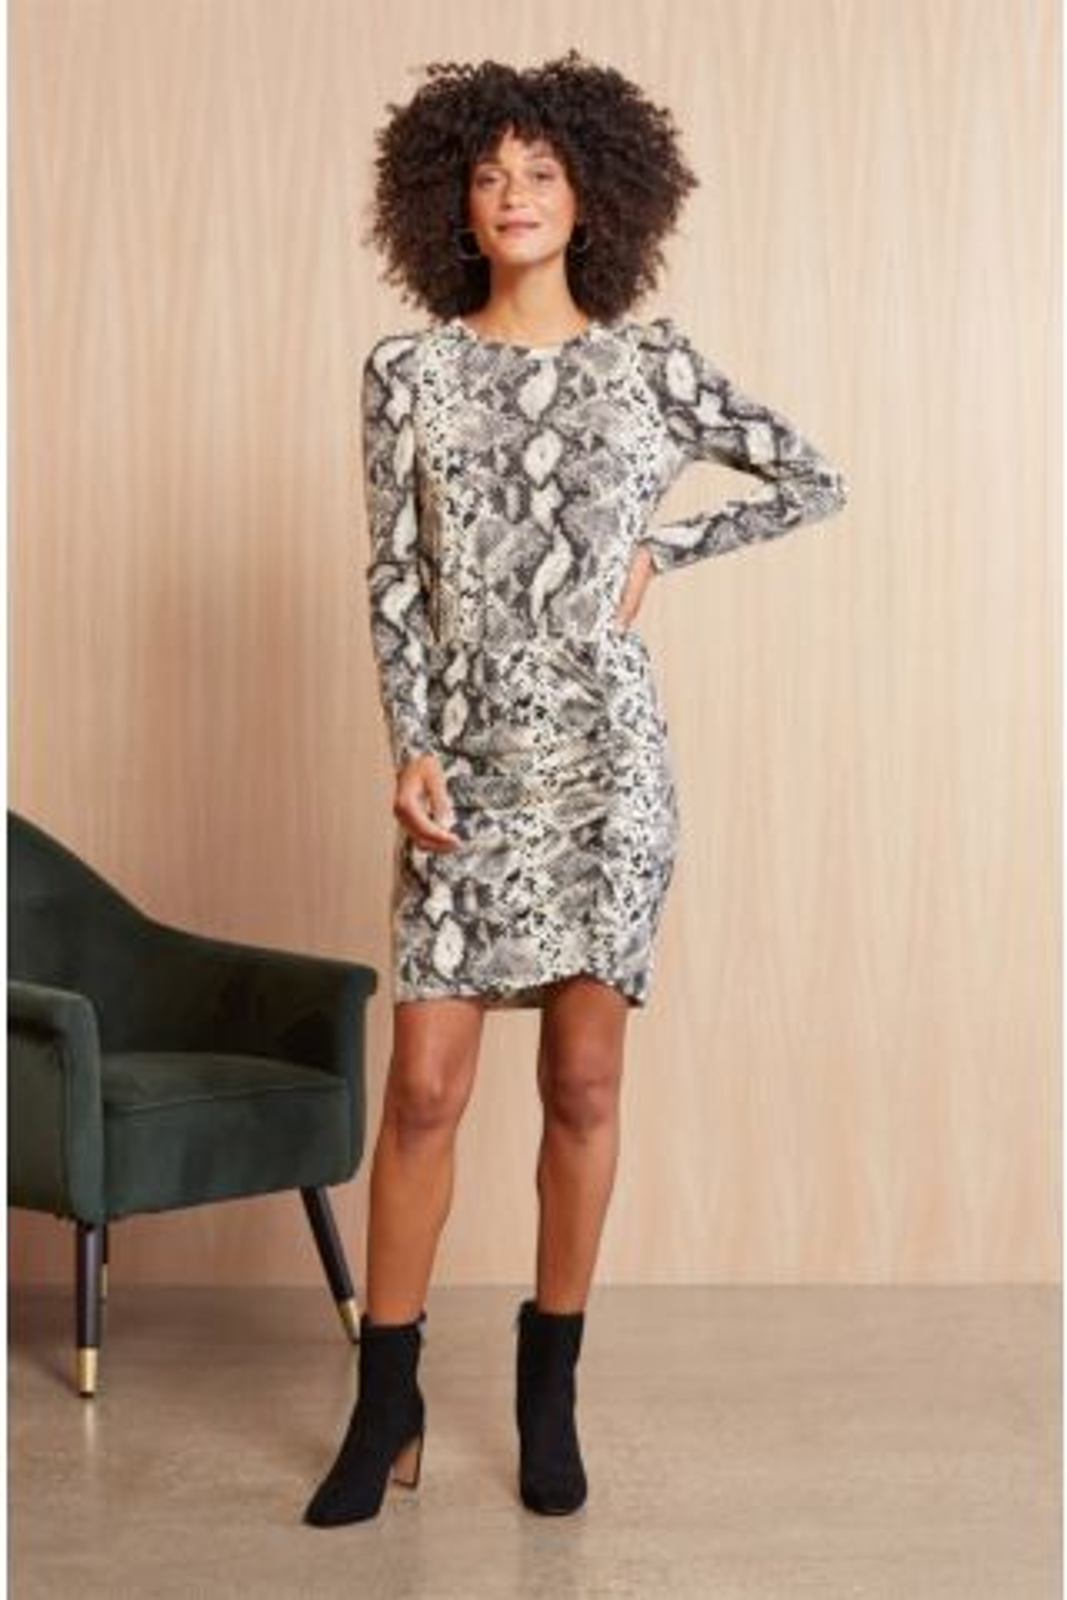 Rebecca Ruched Dress